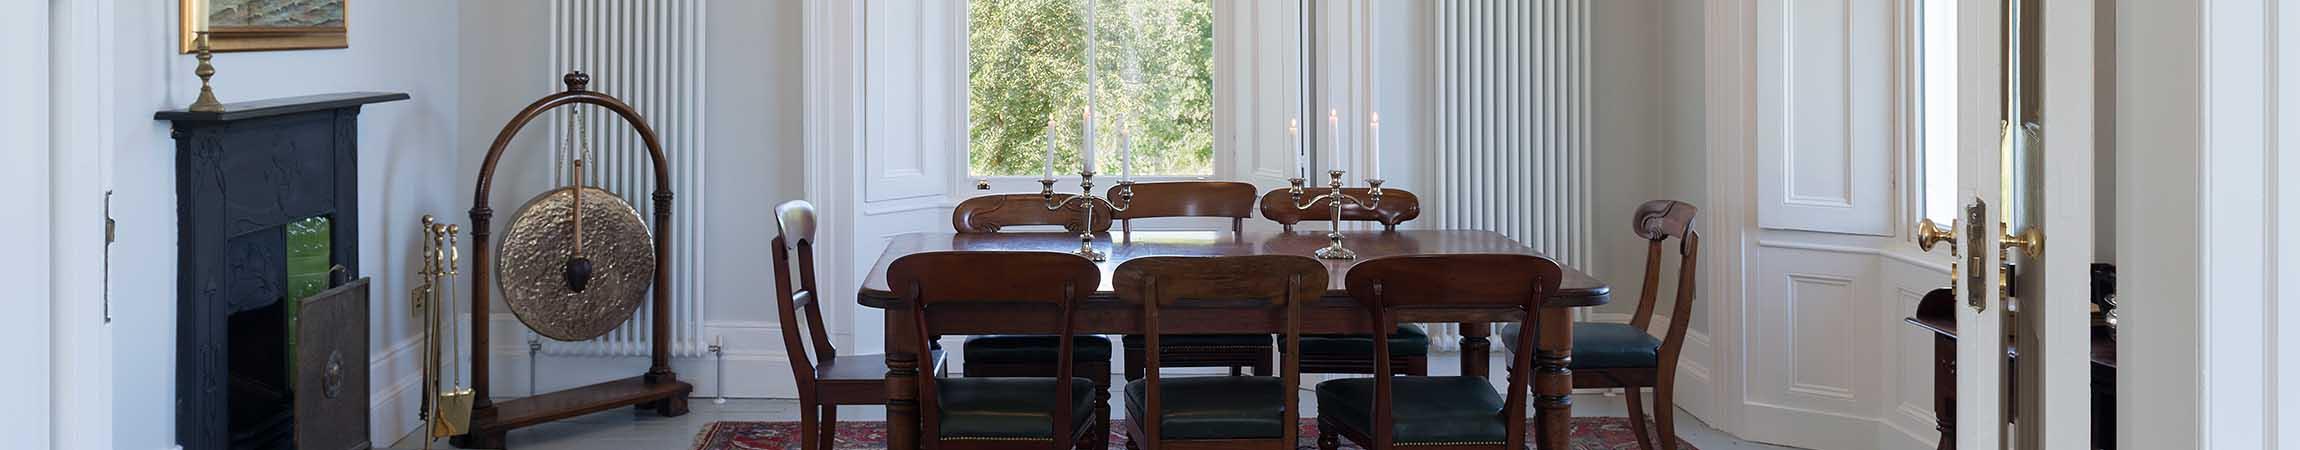 Beitragsbilder_Kildanganhouse-Diningroom